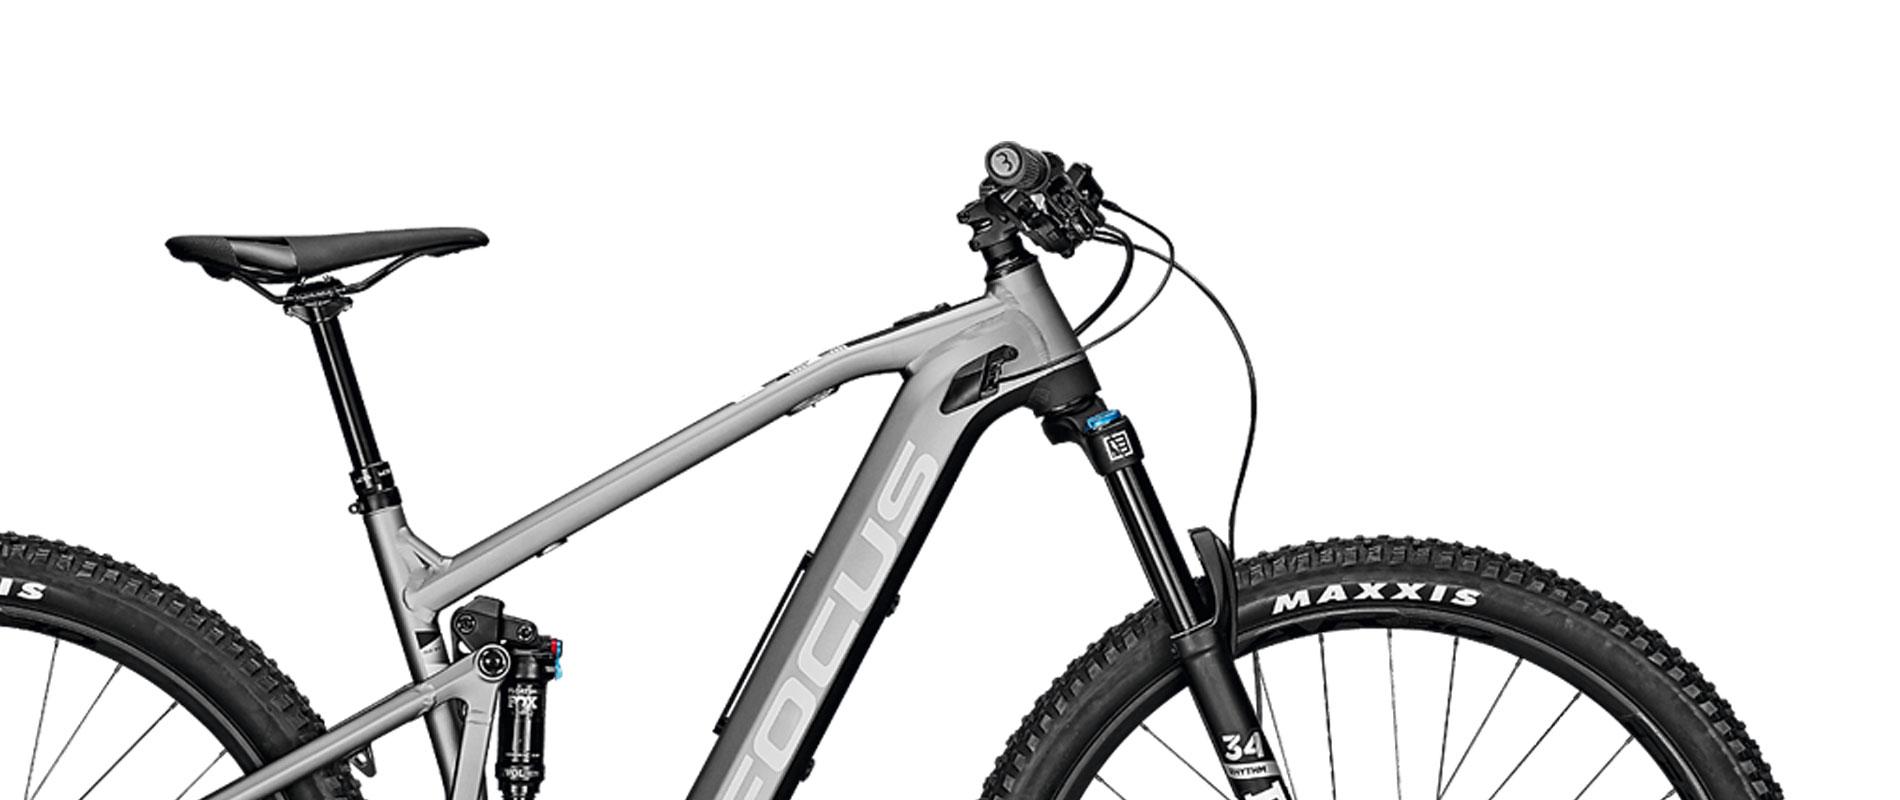 https://bikepointtenerife.com/wp-content/uploads/2019/05/JAM2-5.8-NINE.jpg